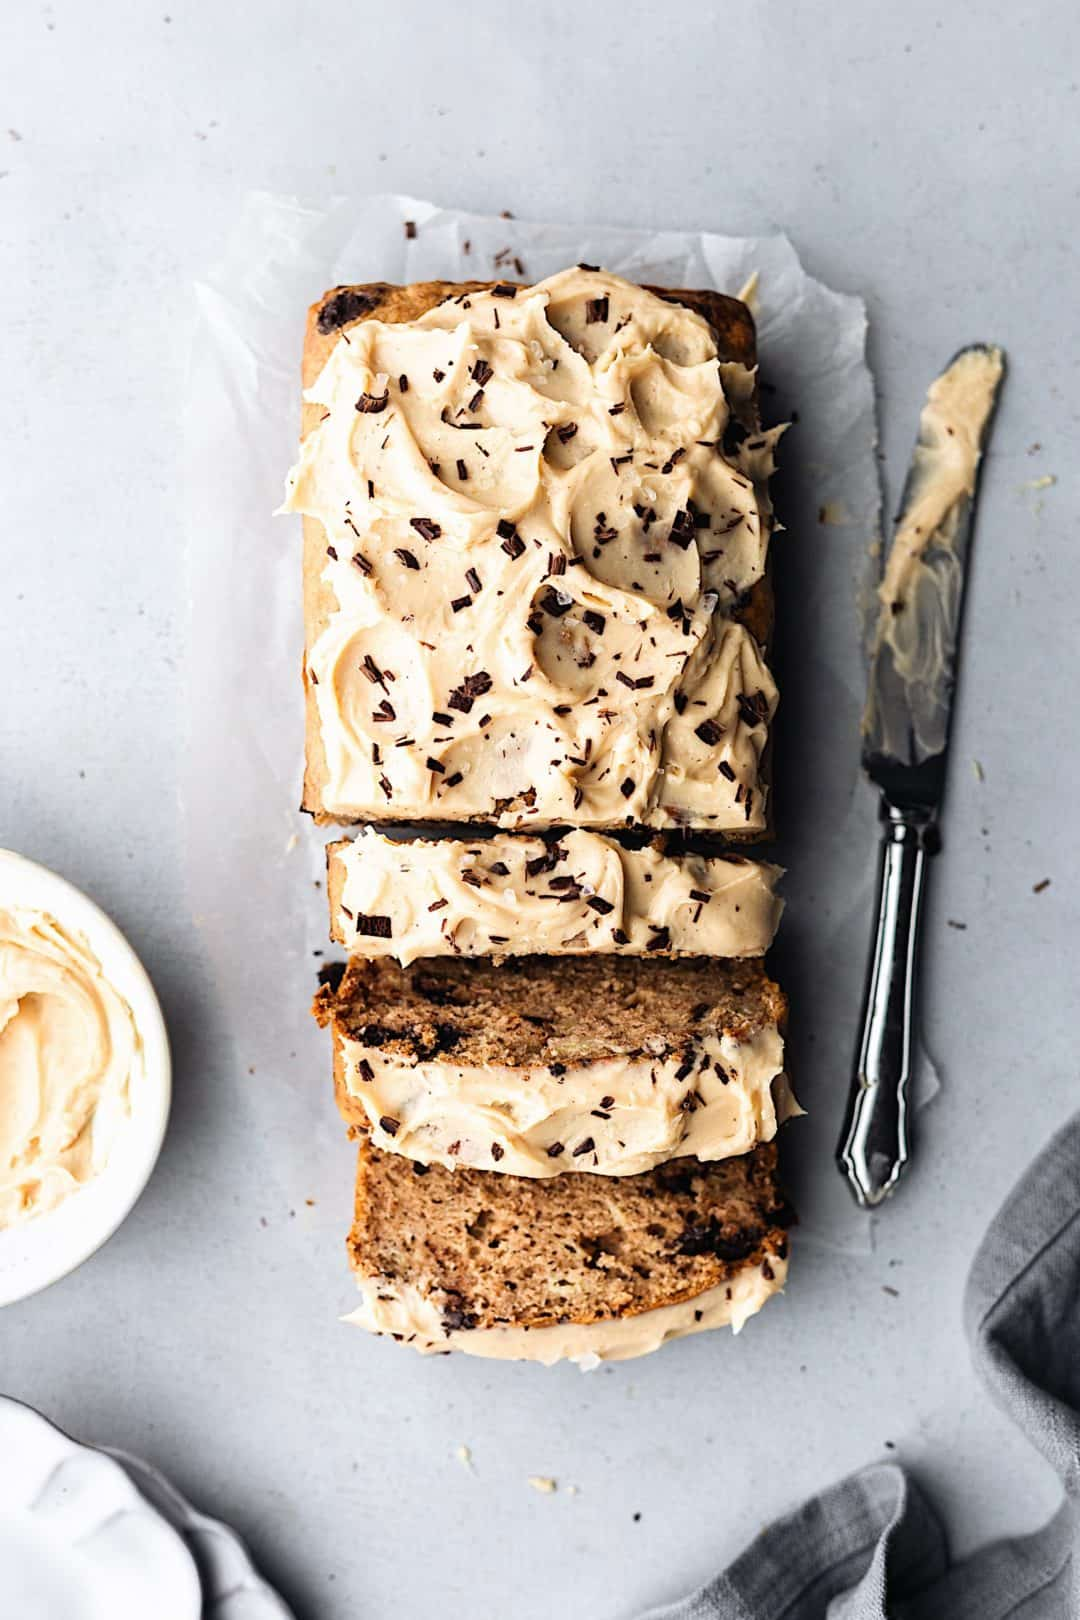 Vegan Chocolate Chip Banana Bread with Peanut Butter Frosting #vegan #recipe #cake